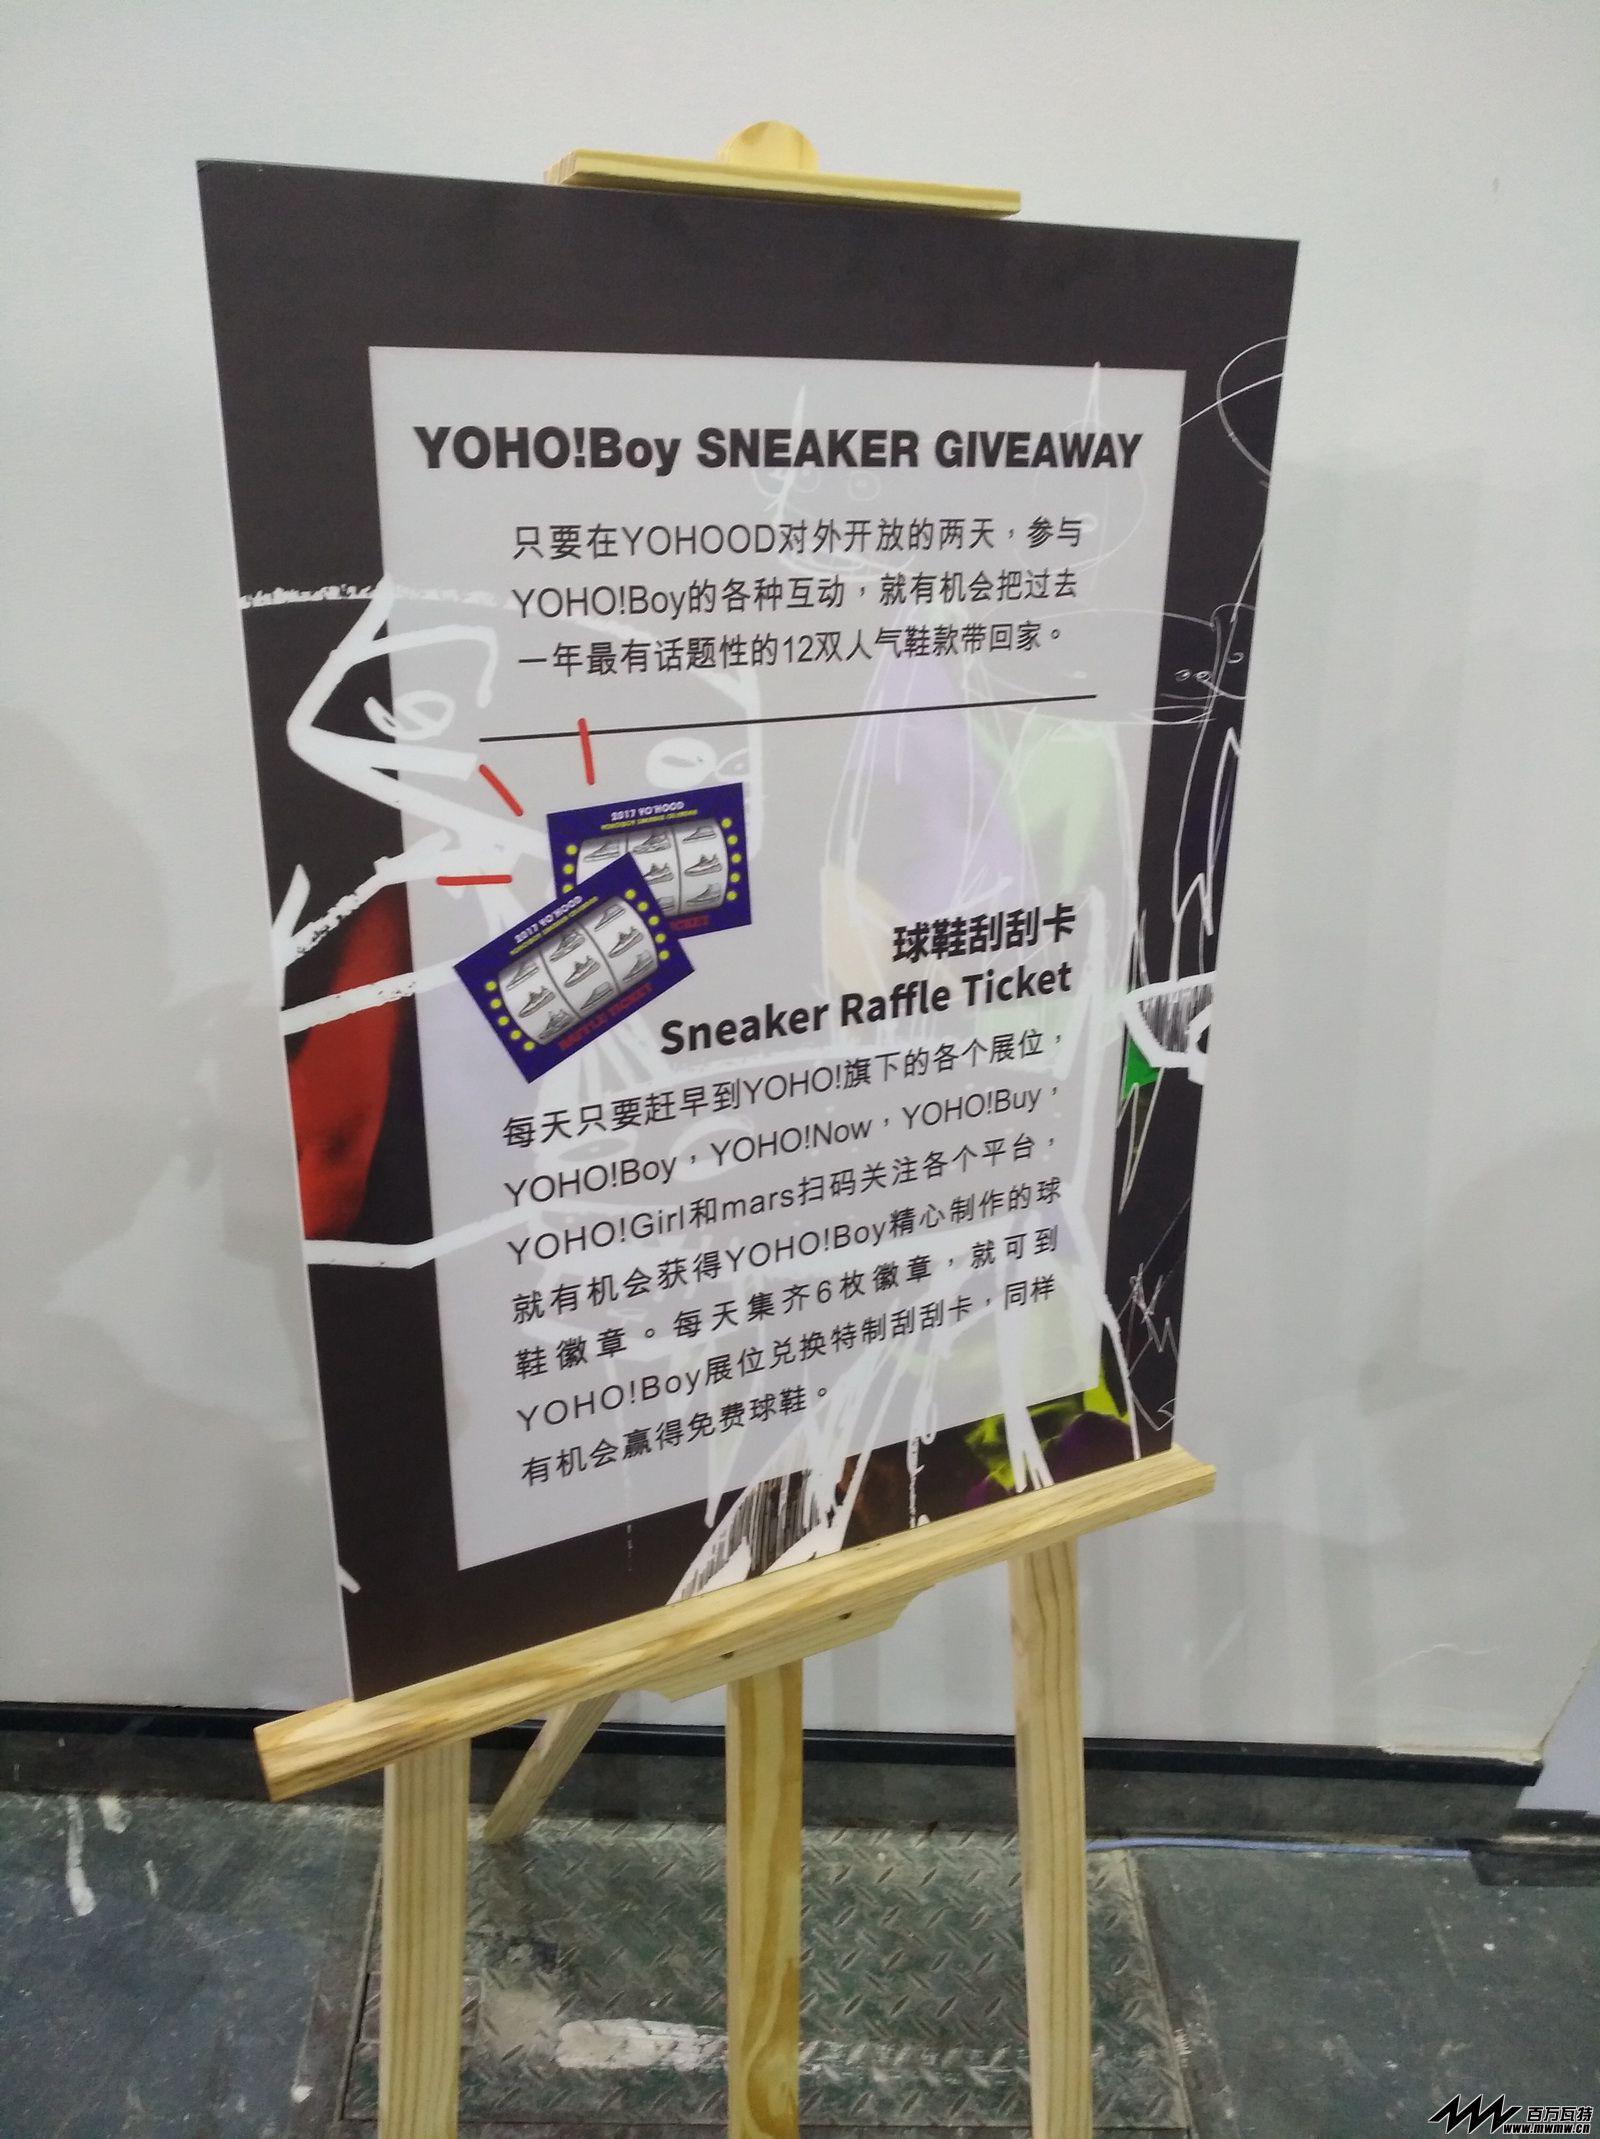 YOHOOD全球潮流嘉年华暨有货潮流新品节 (55).jpg